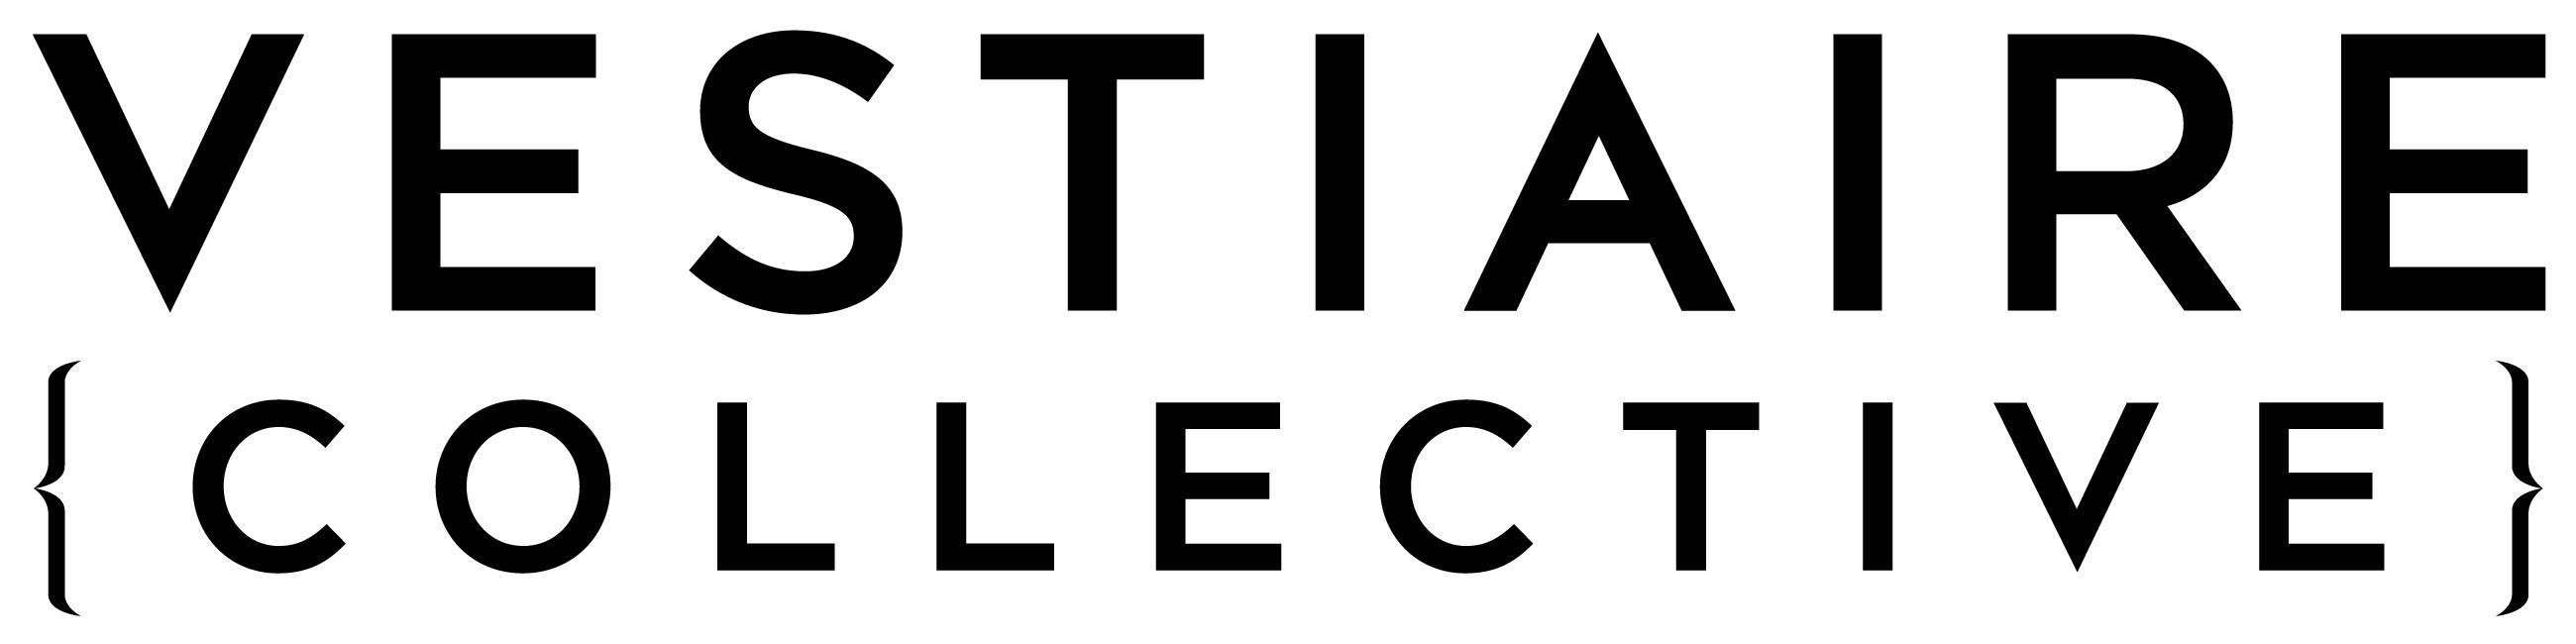 vestiaire-collective